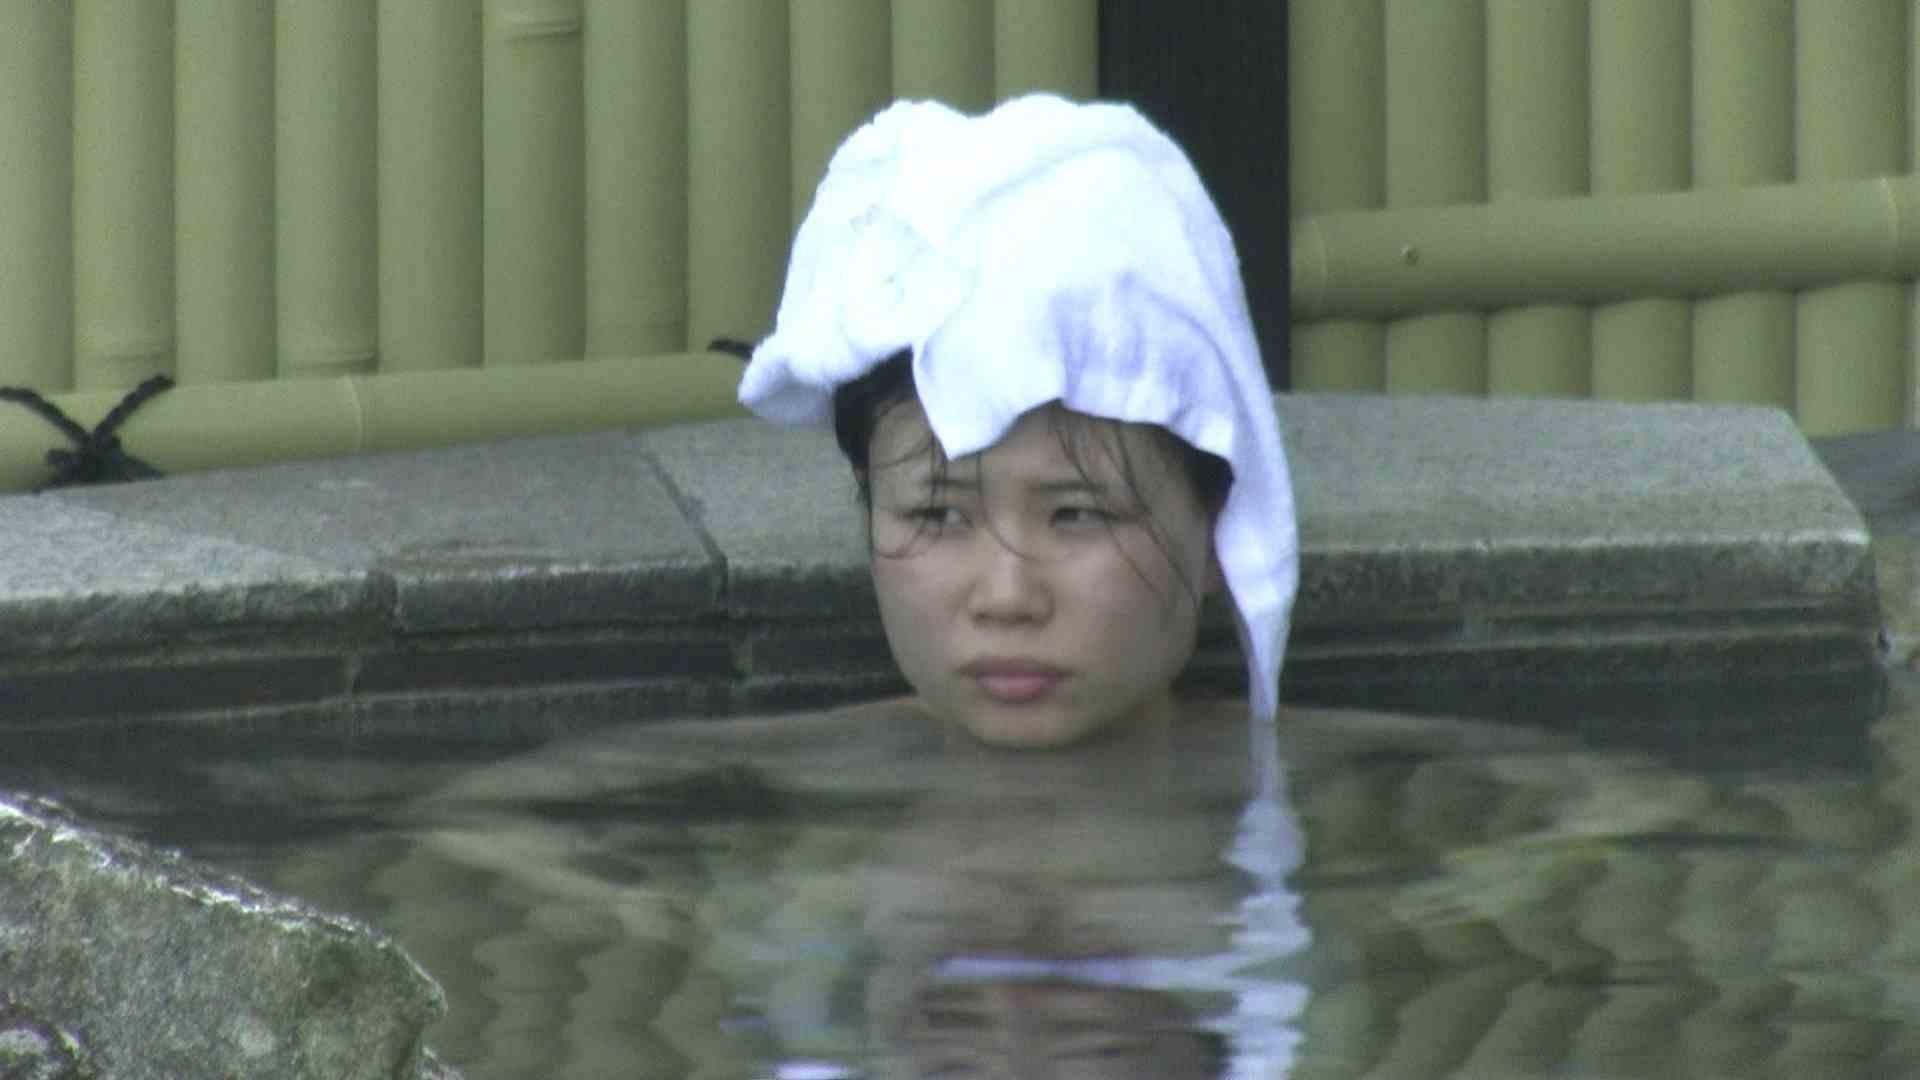 Aquaな露天風呂Vol.183 盗撮 おまんこ無修正動画無料 53枚 44